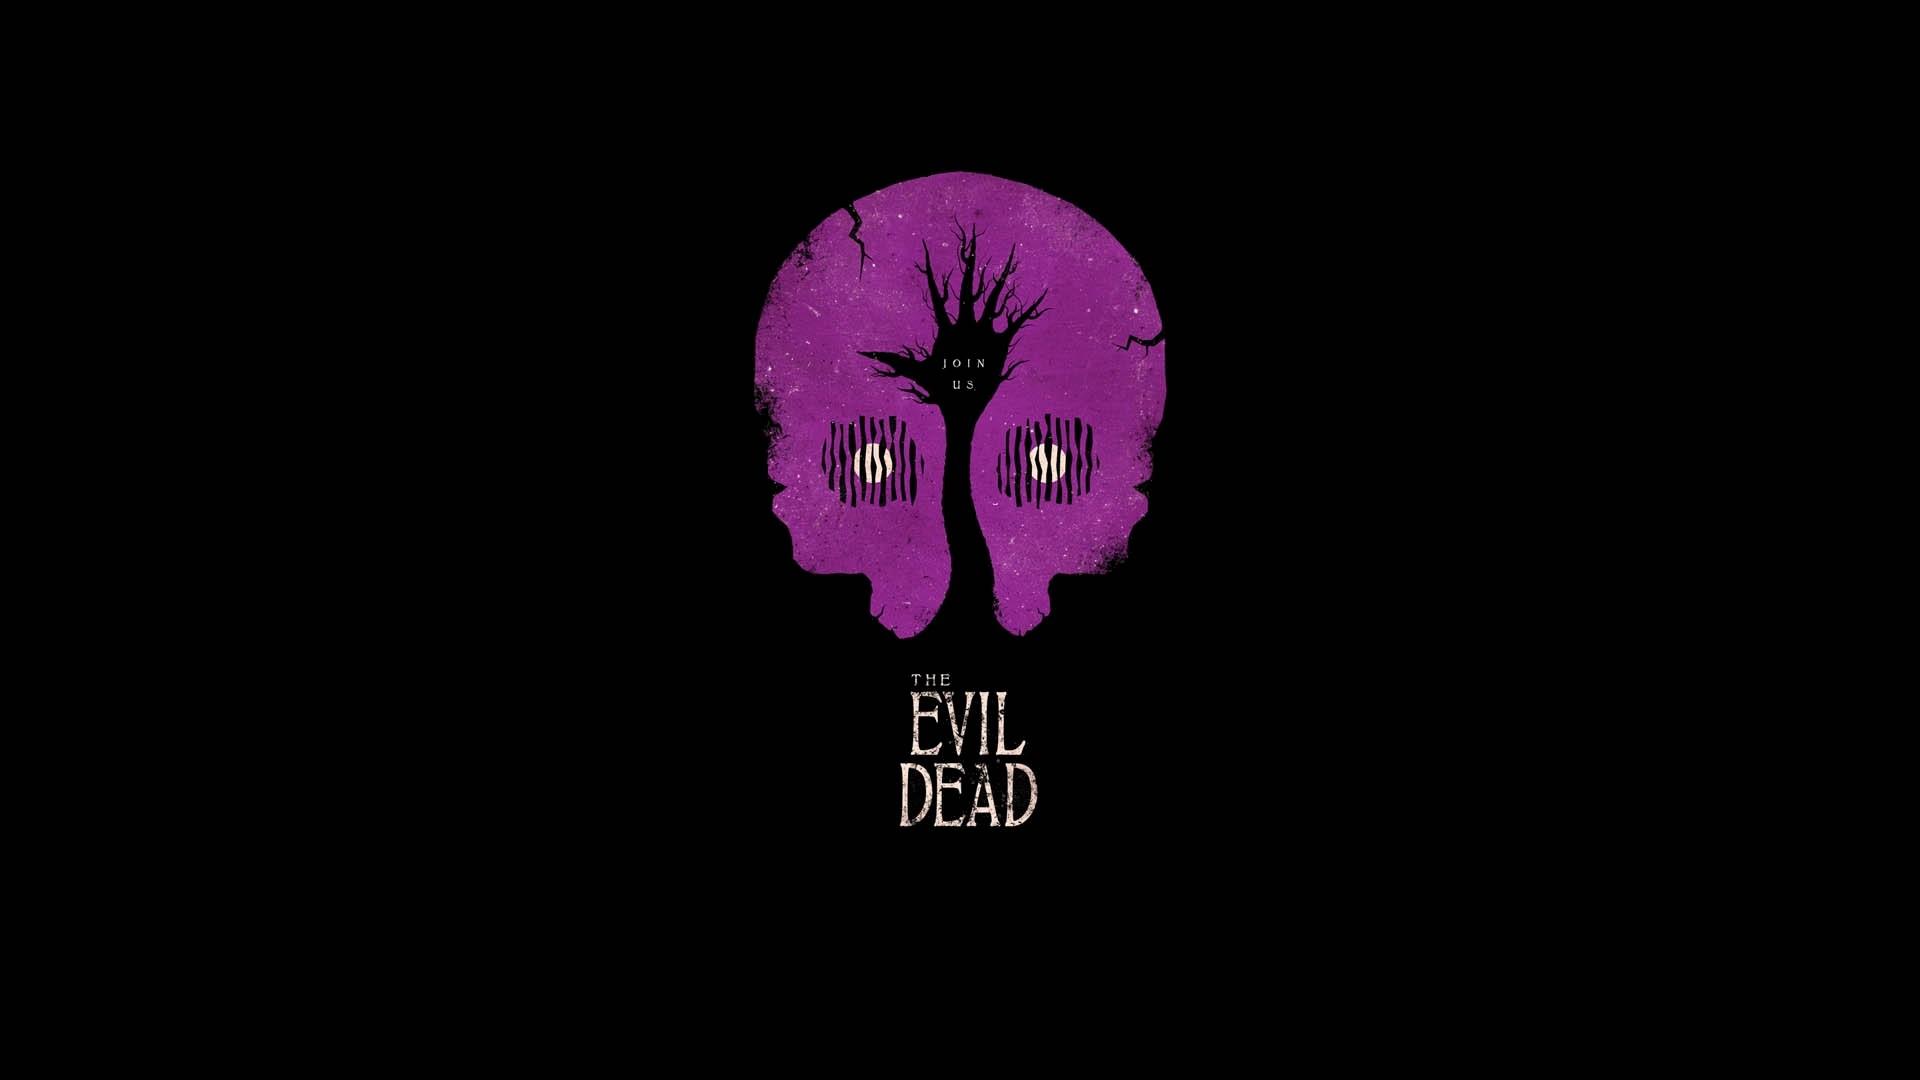 Evil Dead, Minimalism, Artwork, Movies, Black, Simple - Minimalist Wallpaper Dark Simple , HD Wallpaper & Backgrounds